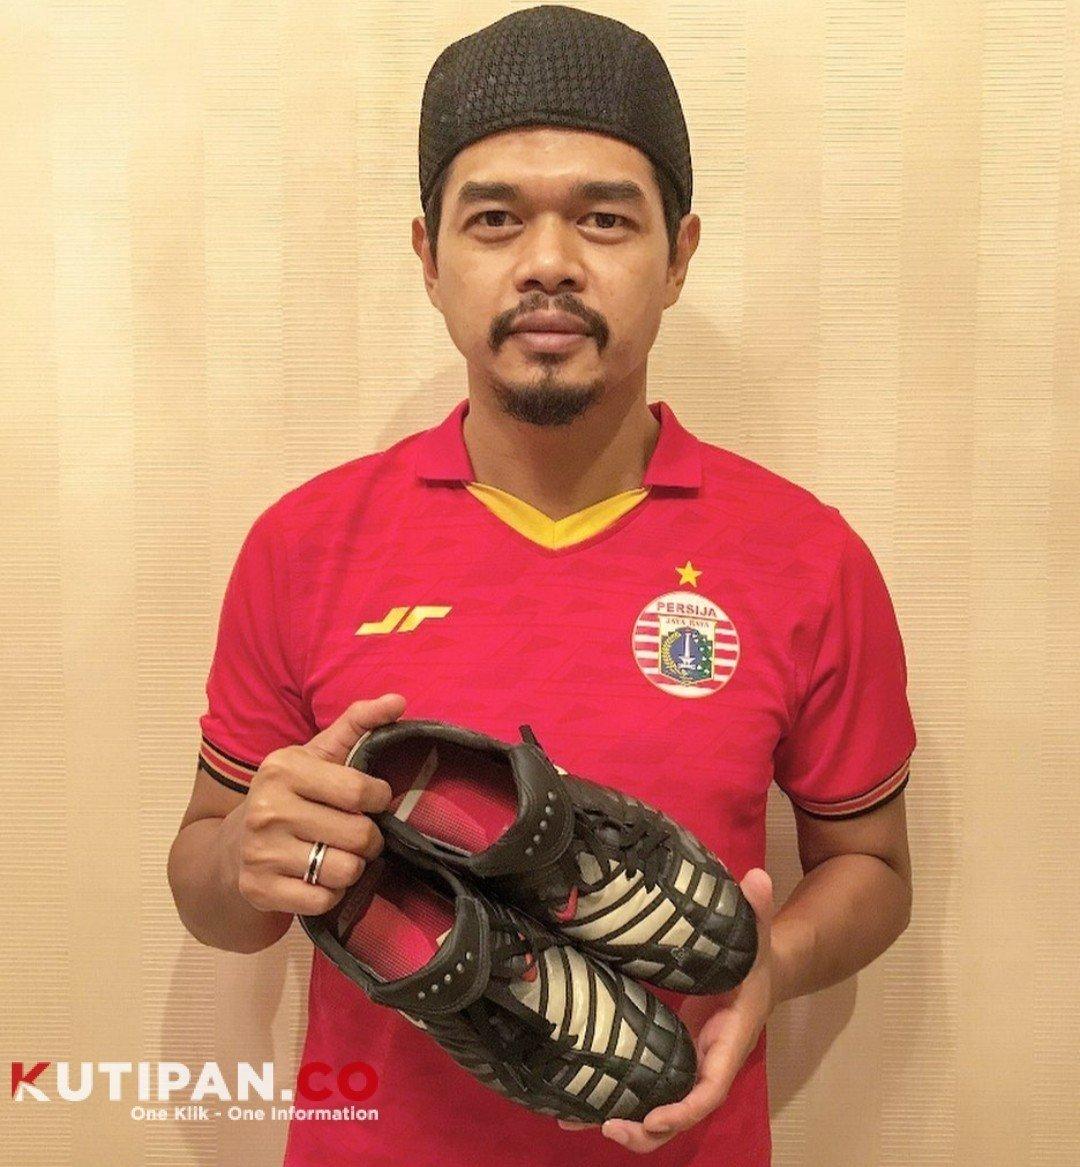 Foto Bambang Pamungkas, Barang lelang lawan Covid-19, Dirumah aja, Persija Jakarta